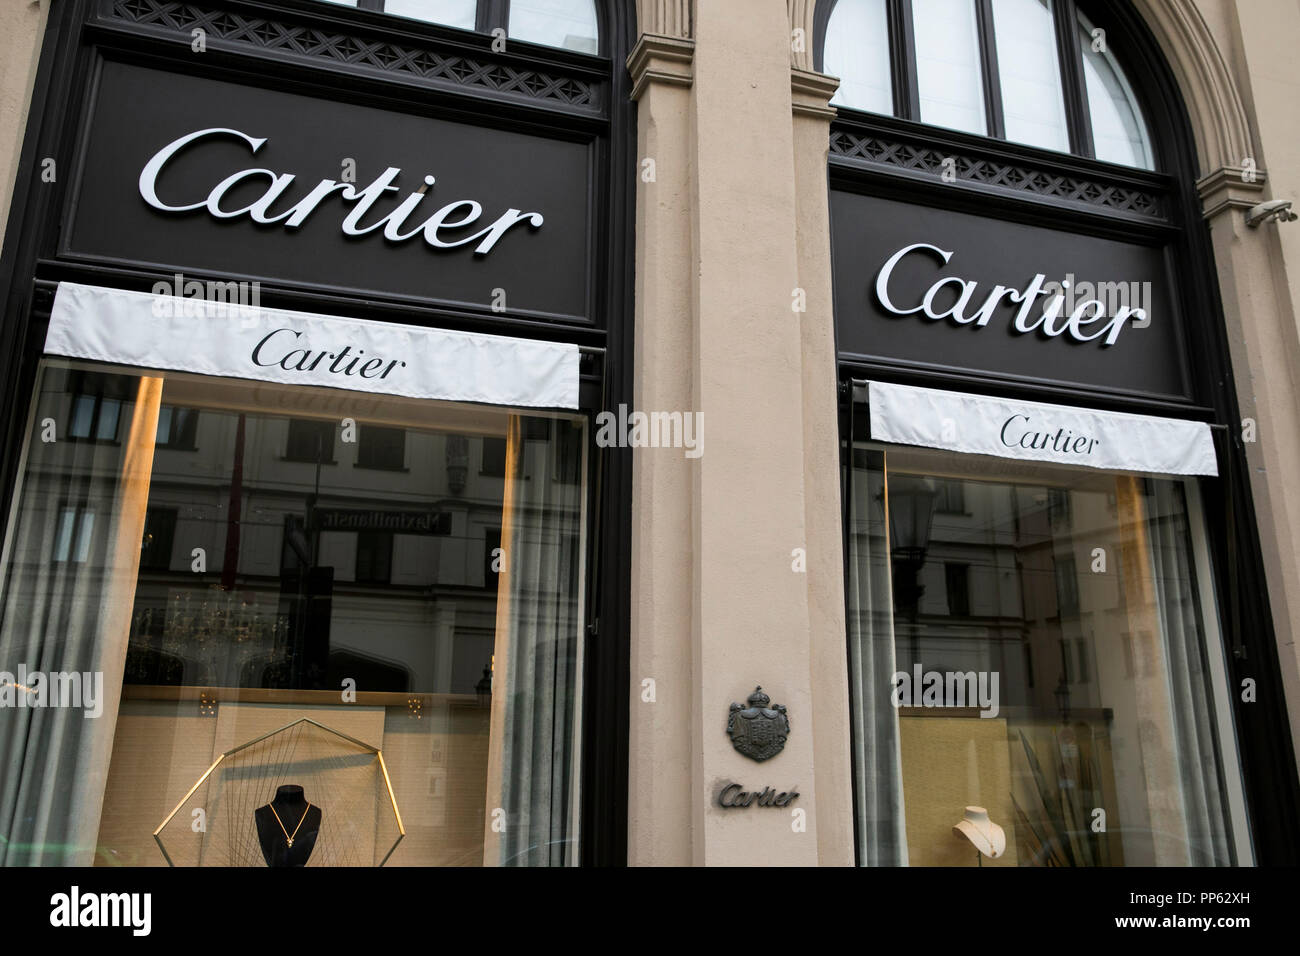 03bb581cf175 Cartier Logo Imágenes De Stock & Cartier Logo Fotos De Stock - Alamy